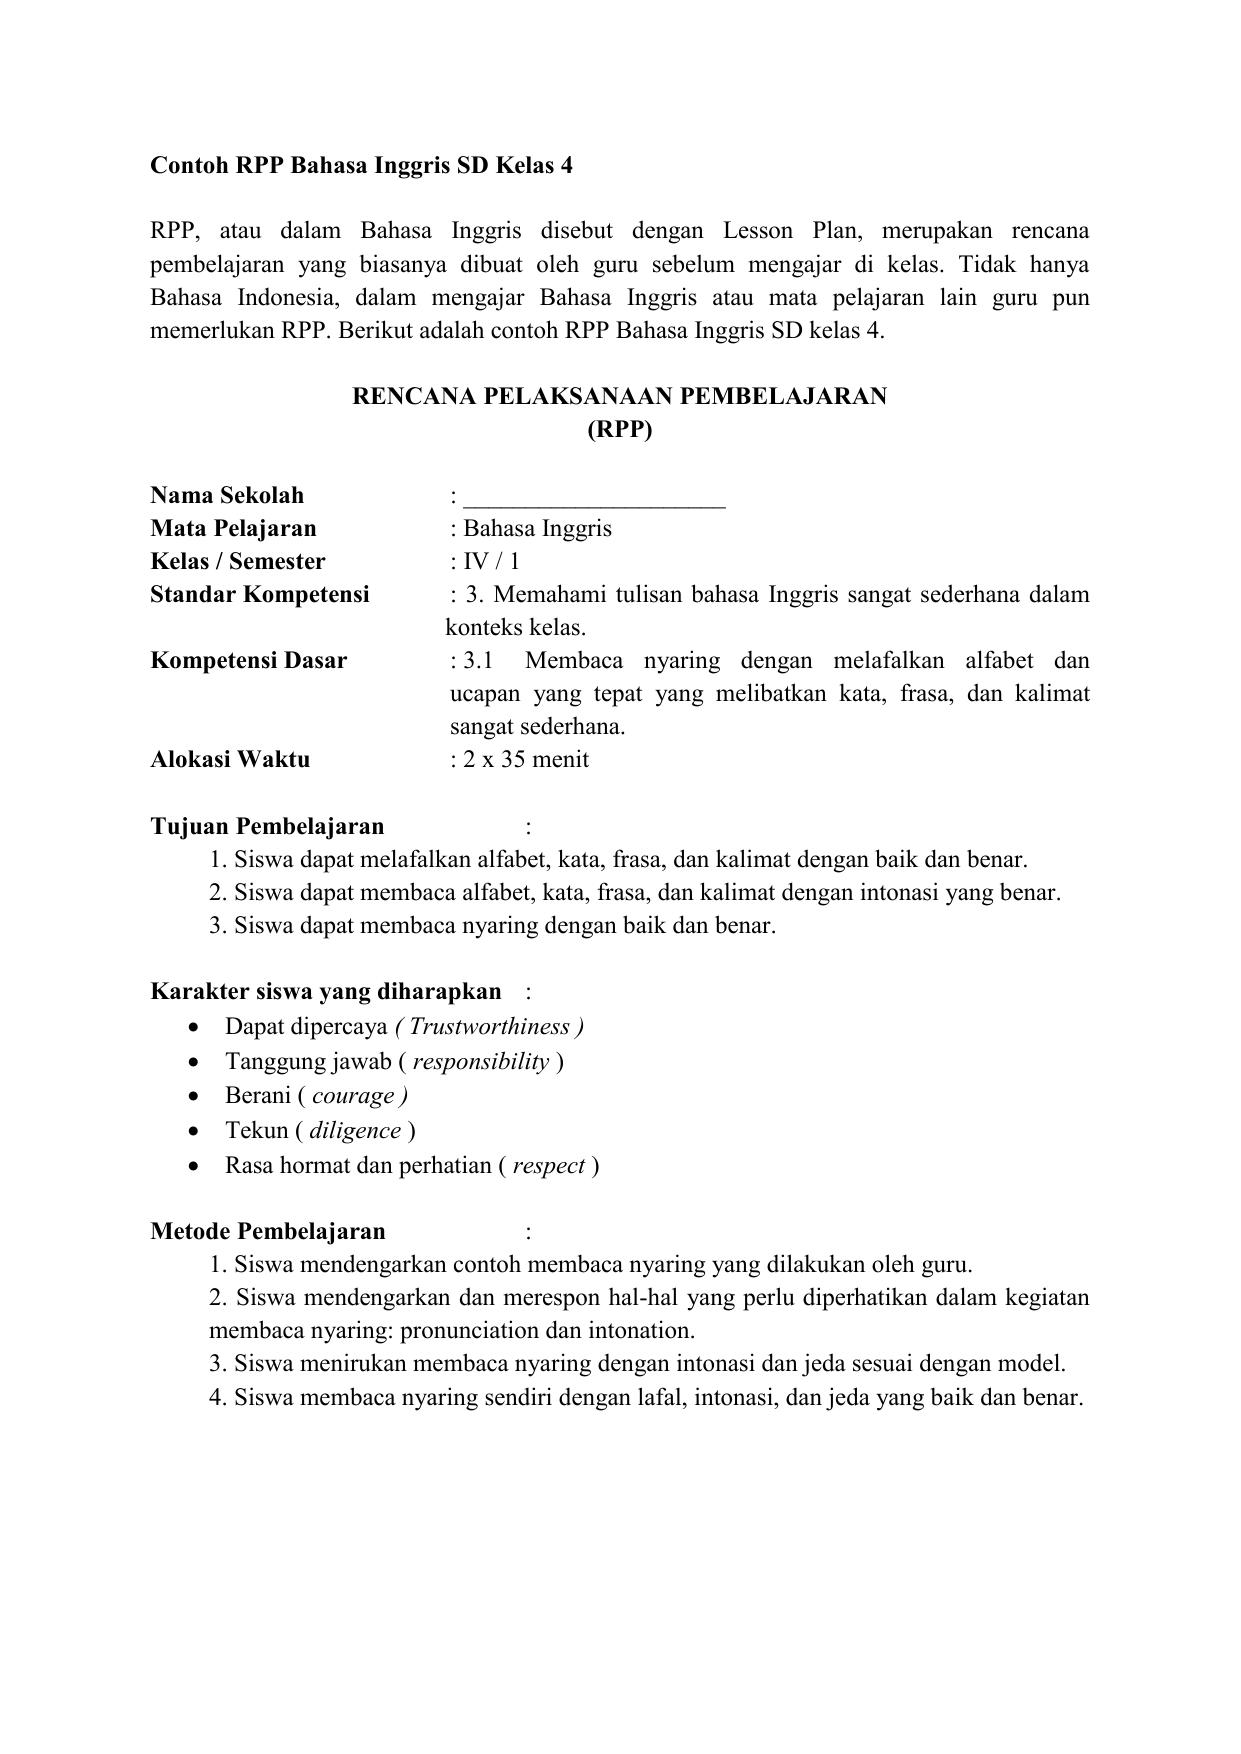 Contoh Rpp Bahasa Inggris Sd Kelas 4